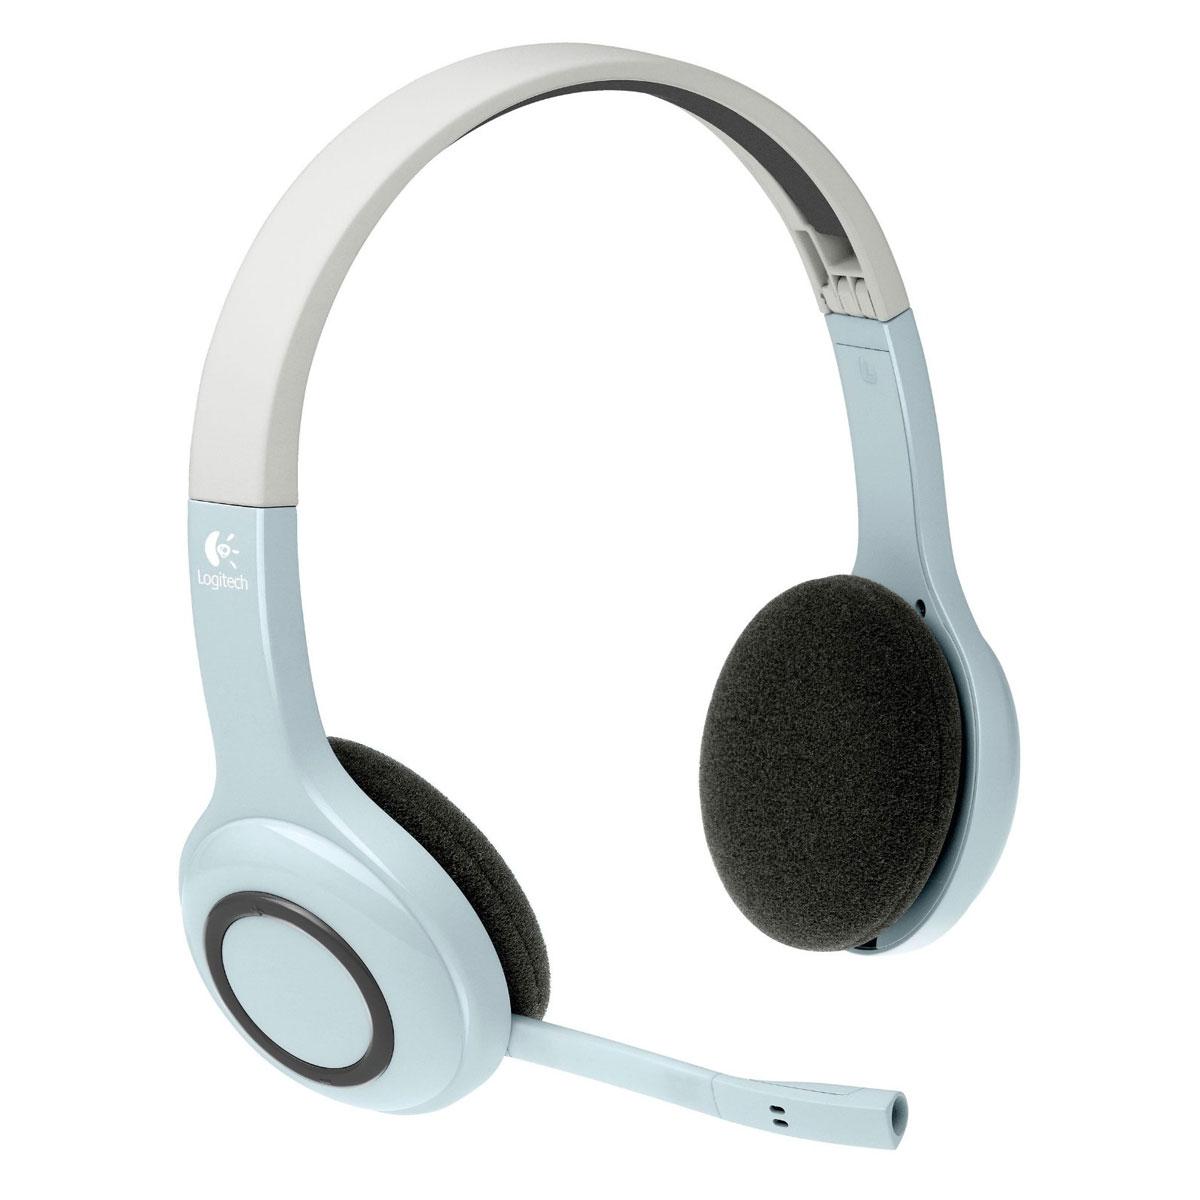 logitech wireless headset h609 for ipad micro casque logitech sur. Black Bedroom Furniture Sets. Home Design Ideas